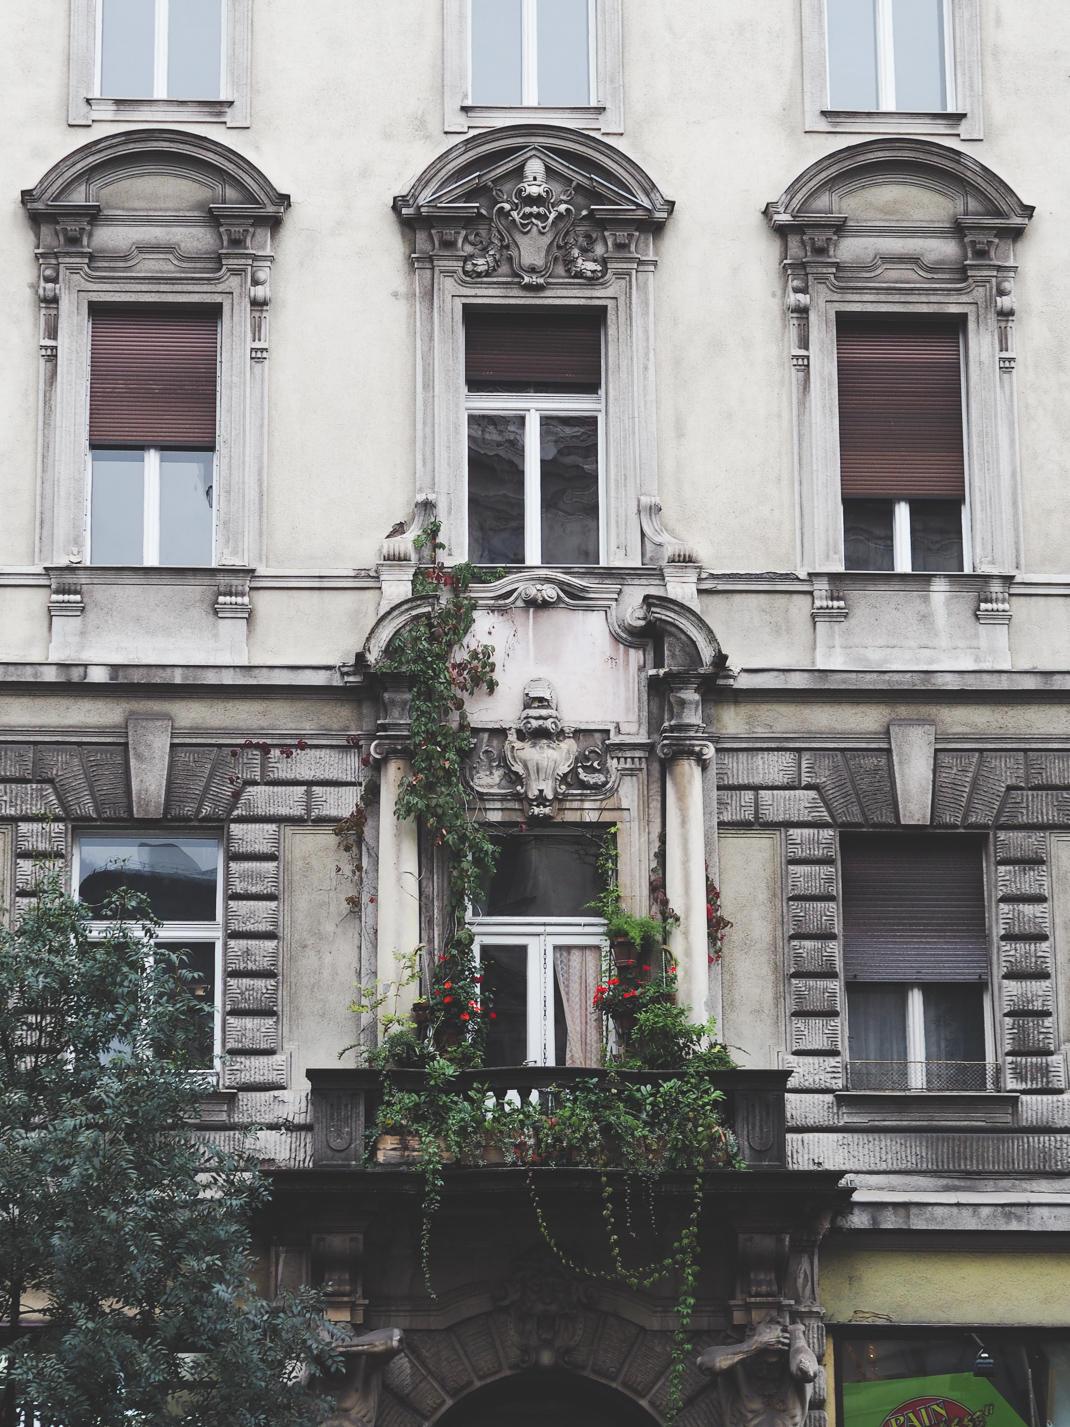 budapest architecture